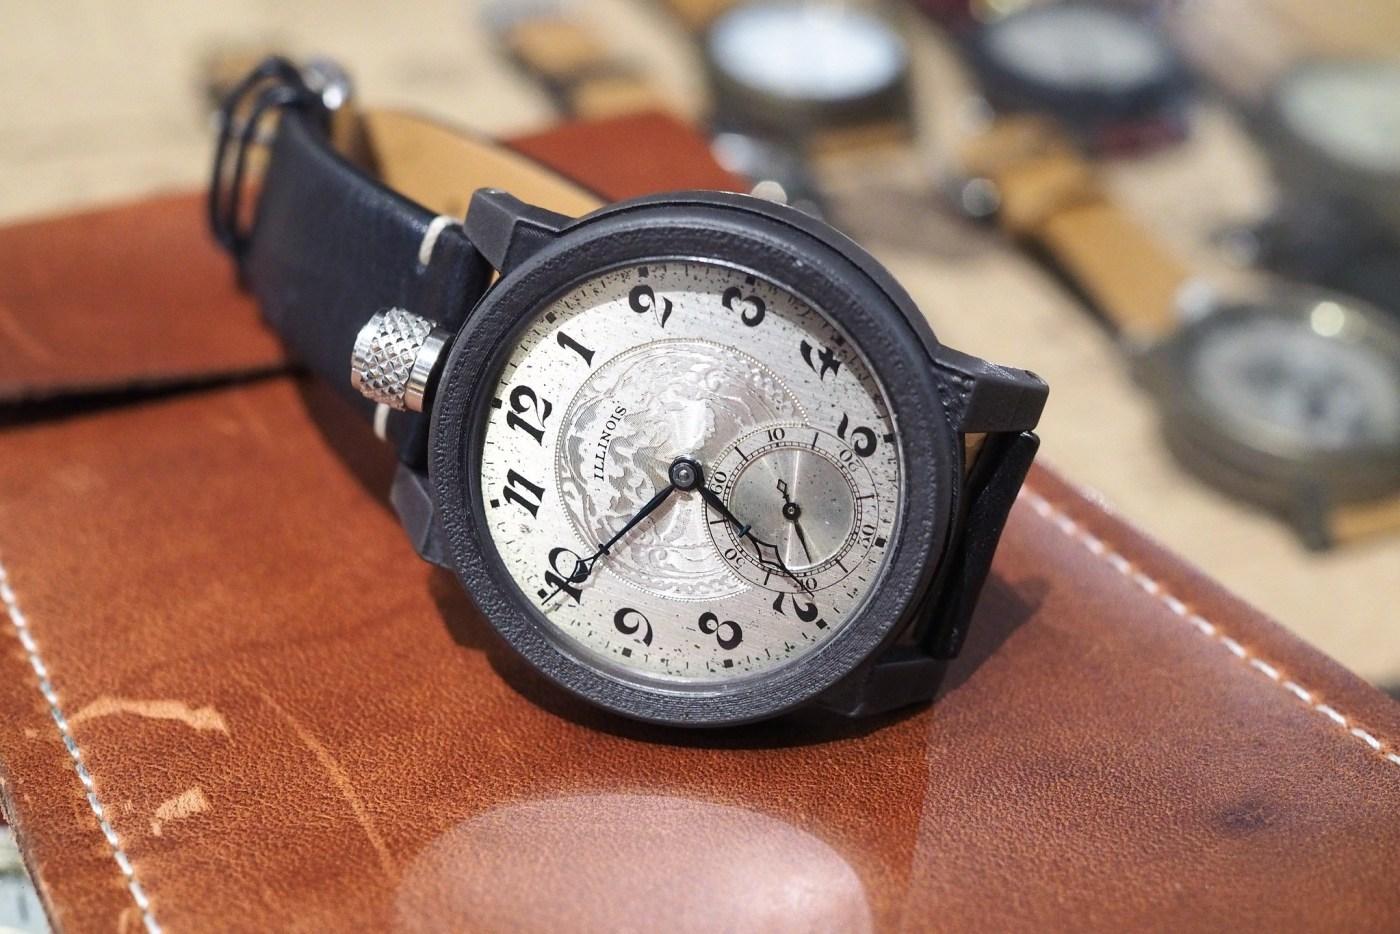 Vortic Watch Co.